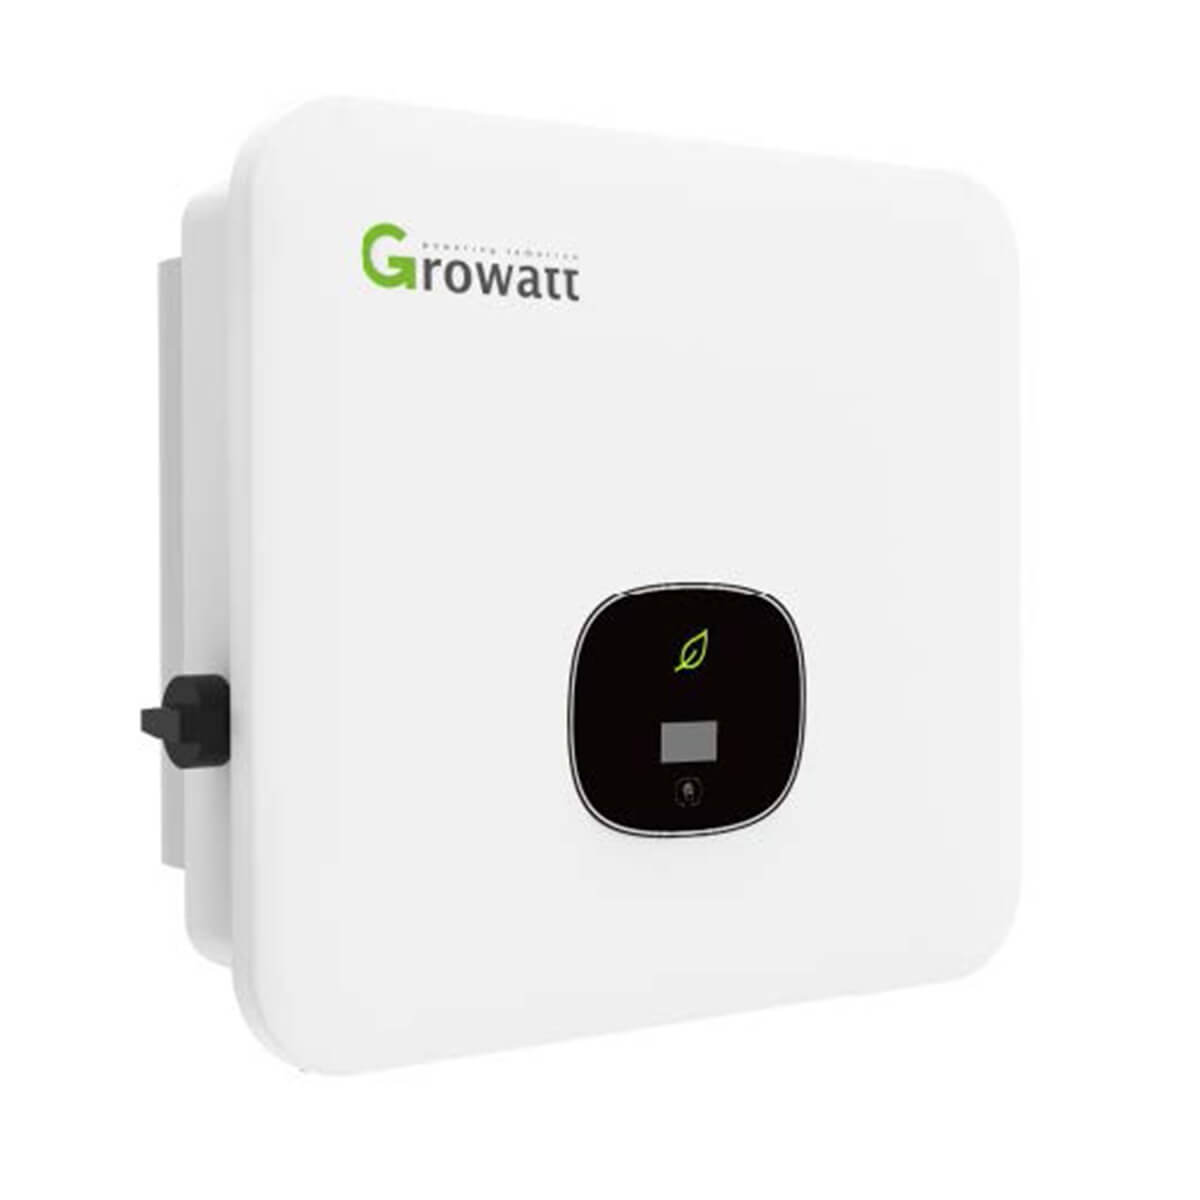 growatt 13kW inverter, growatt mod 13kW inverter, growatt mod 13ktl3-x inverter, growatt mod 13ktl3-x, growatt mod 13 kW, GROWATT 13 KW